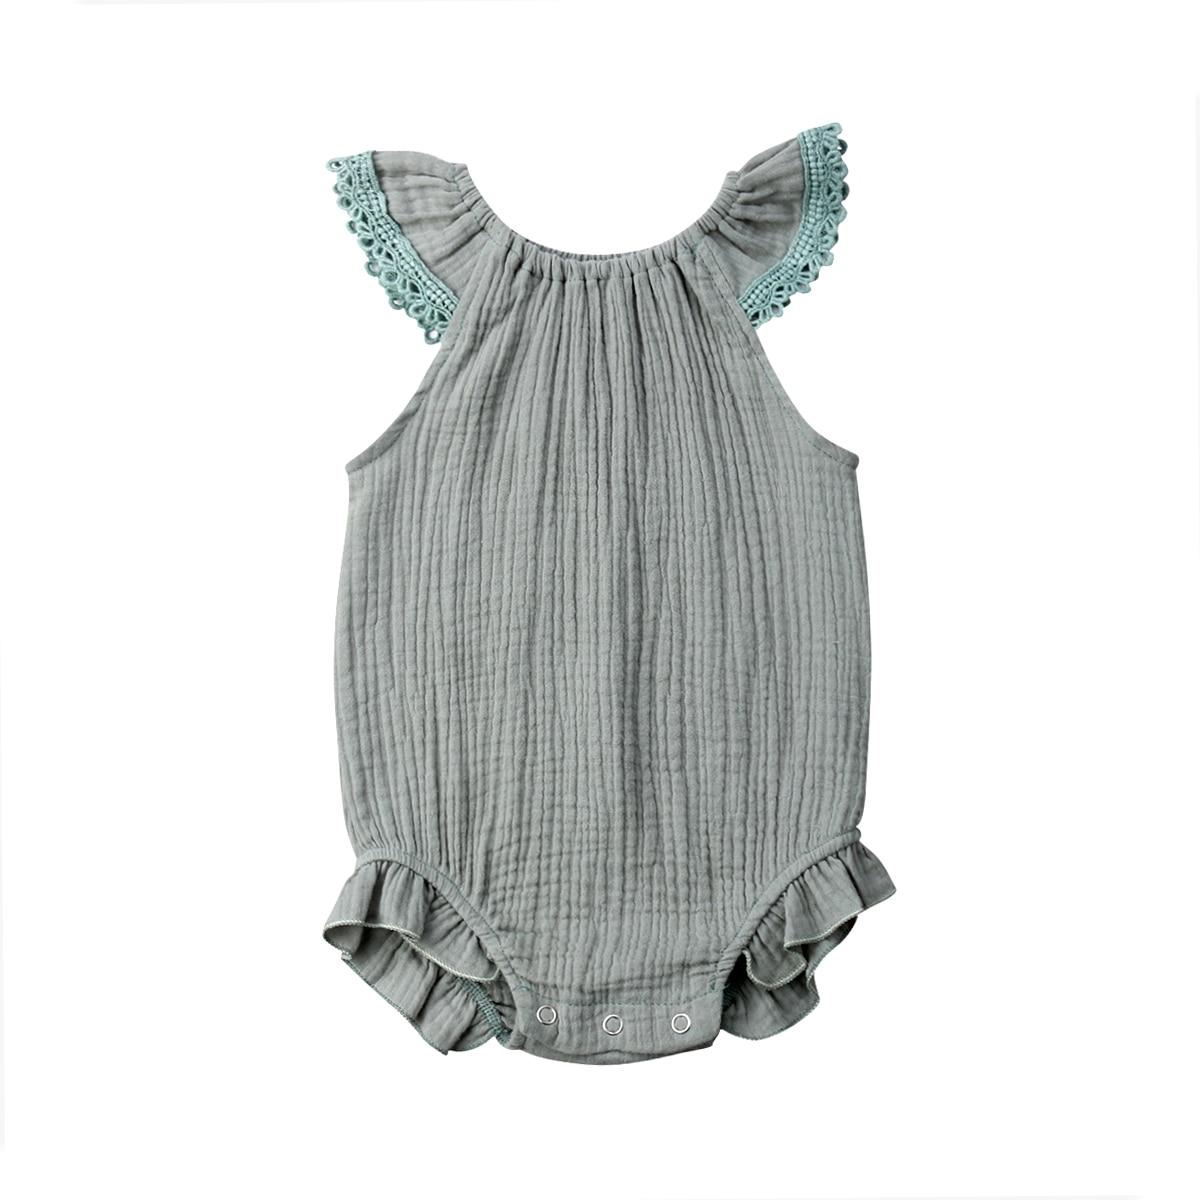 Summer Infant Newborn Baby Girls Clothing Lace Ruffle Sleeveless   Romper   Jumpsuit Baby Girls Costumes 0-18M